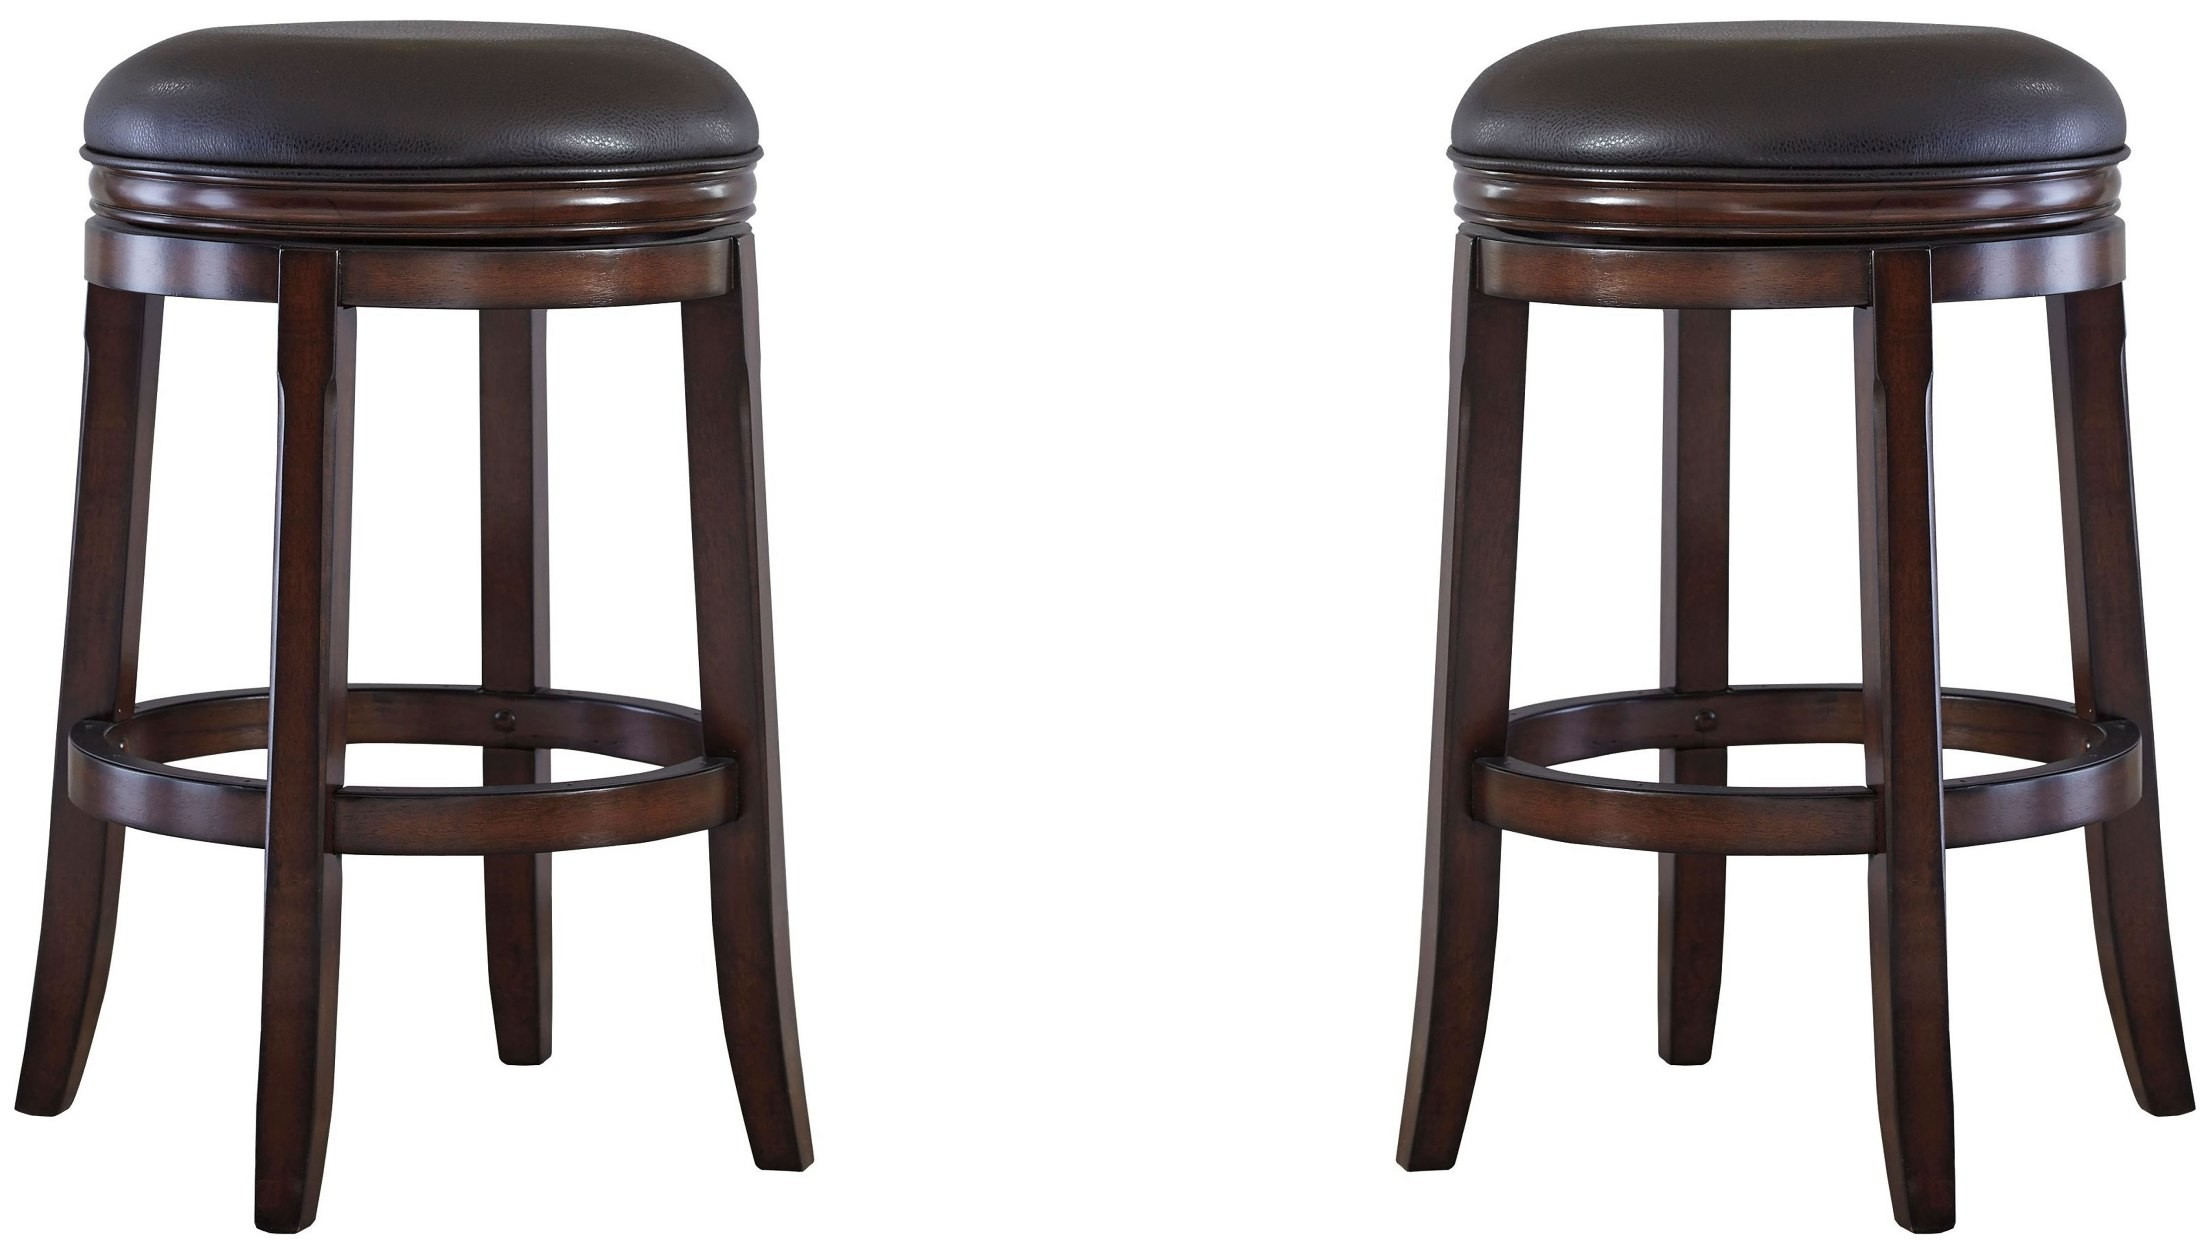 Ashley Furniture Porter Bar Stools